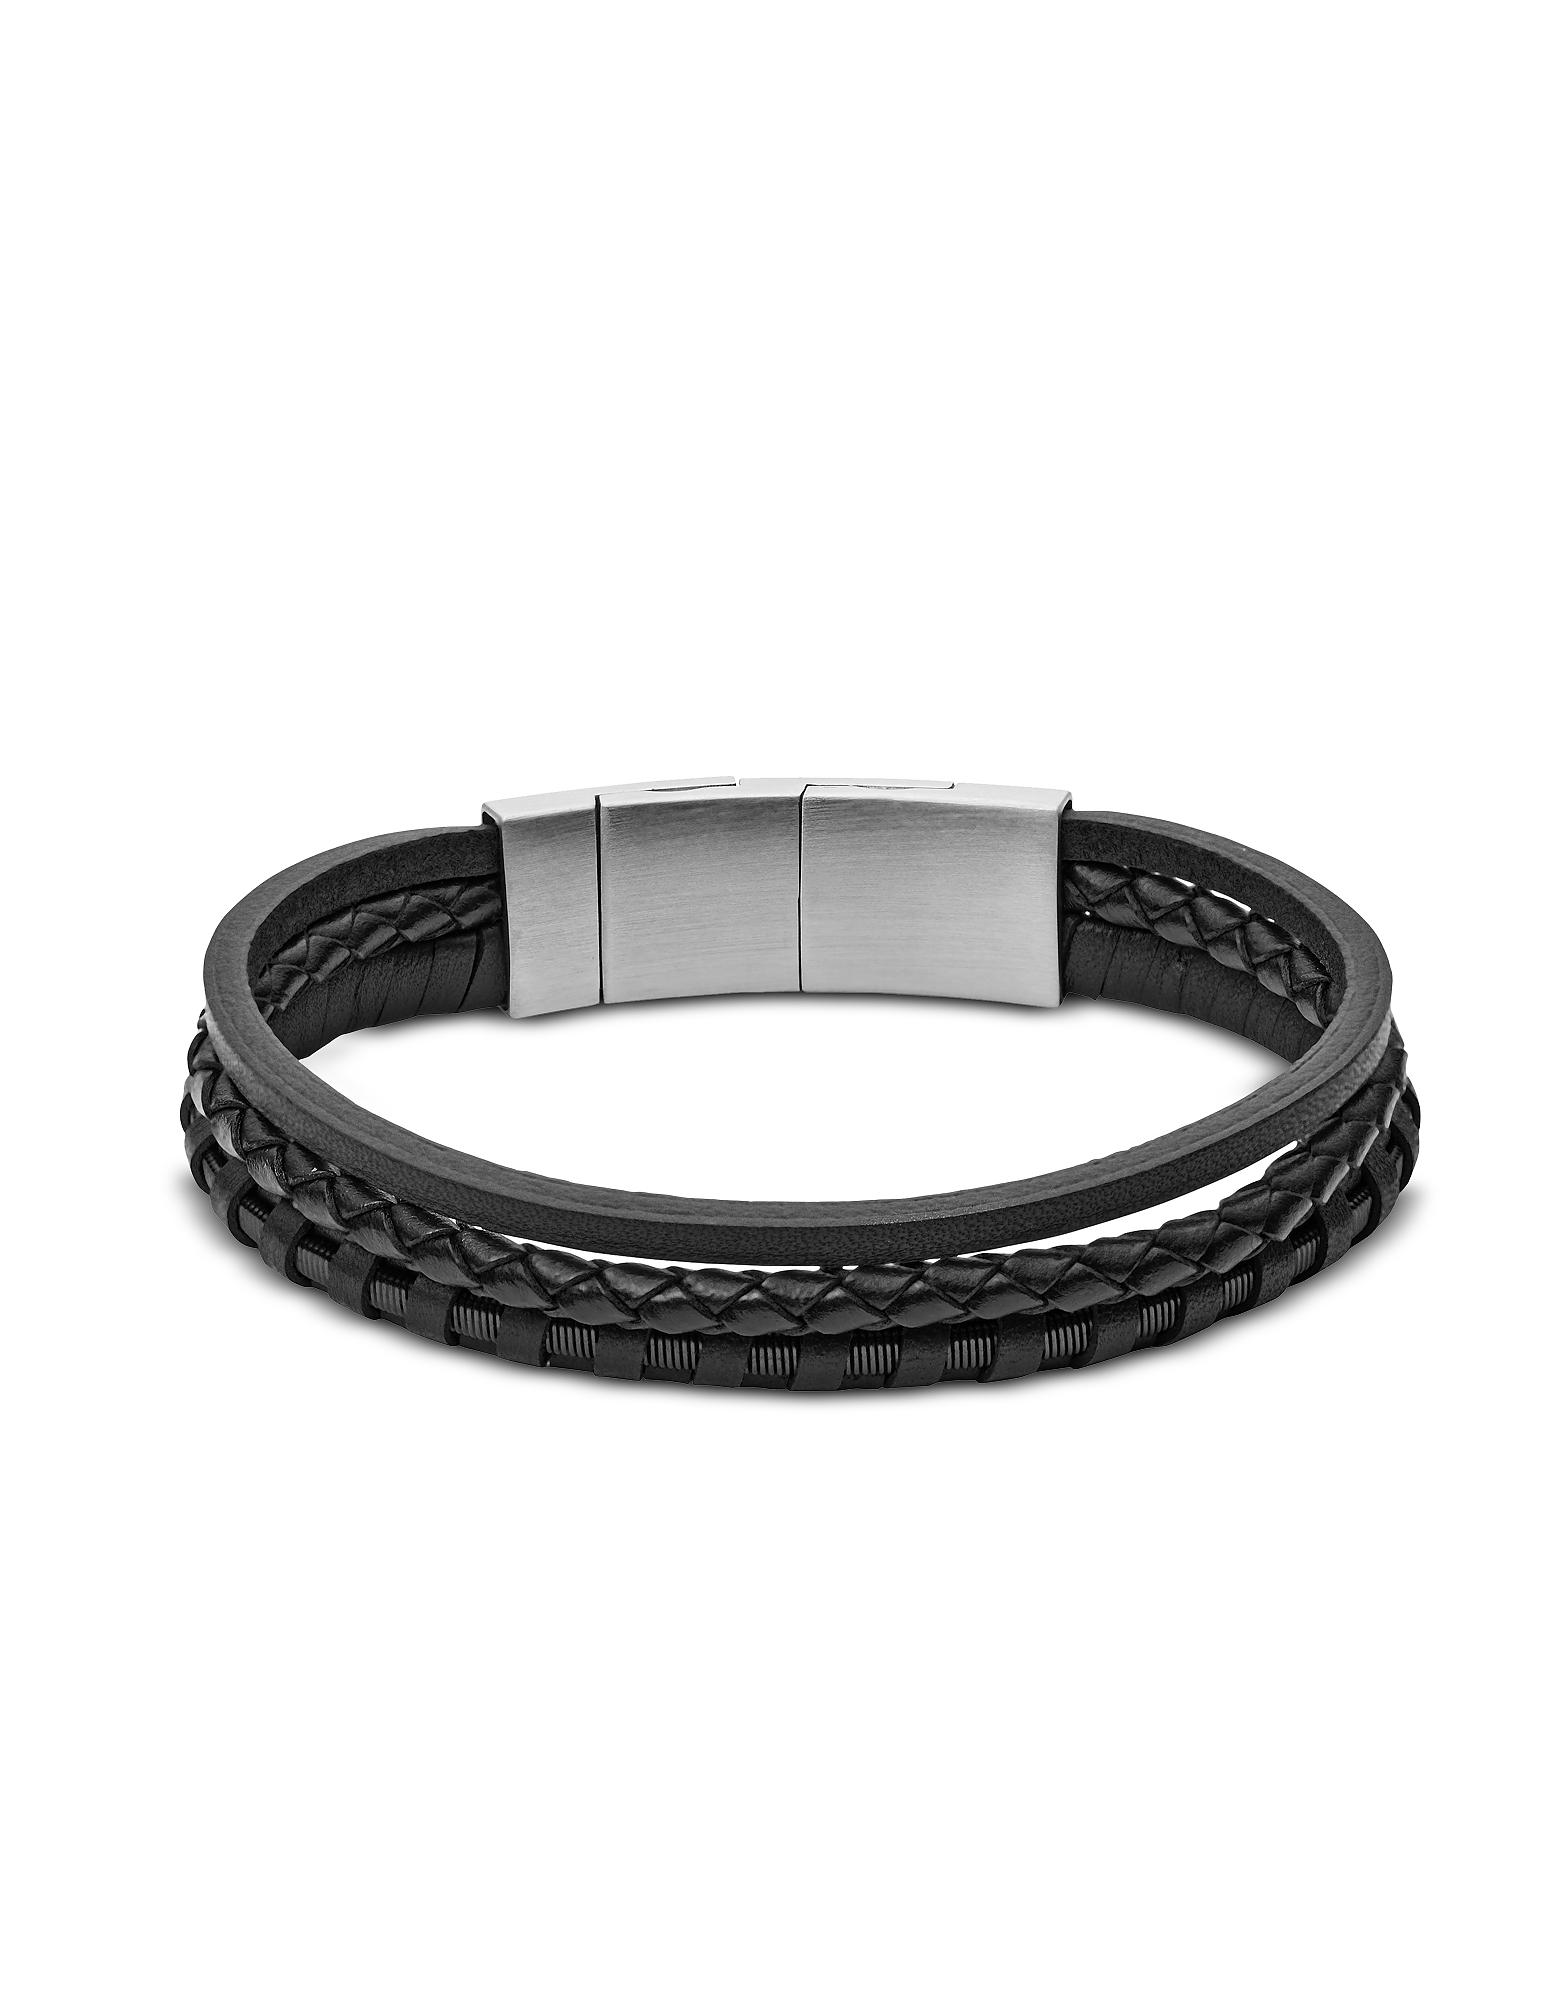 Fossil Men's Bracelets, JF02935001 Vintage casual Men's Bracelet